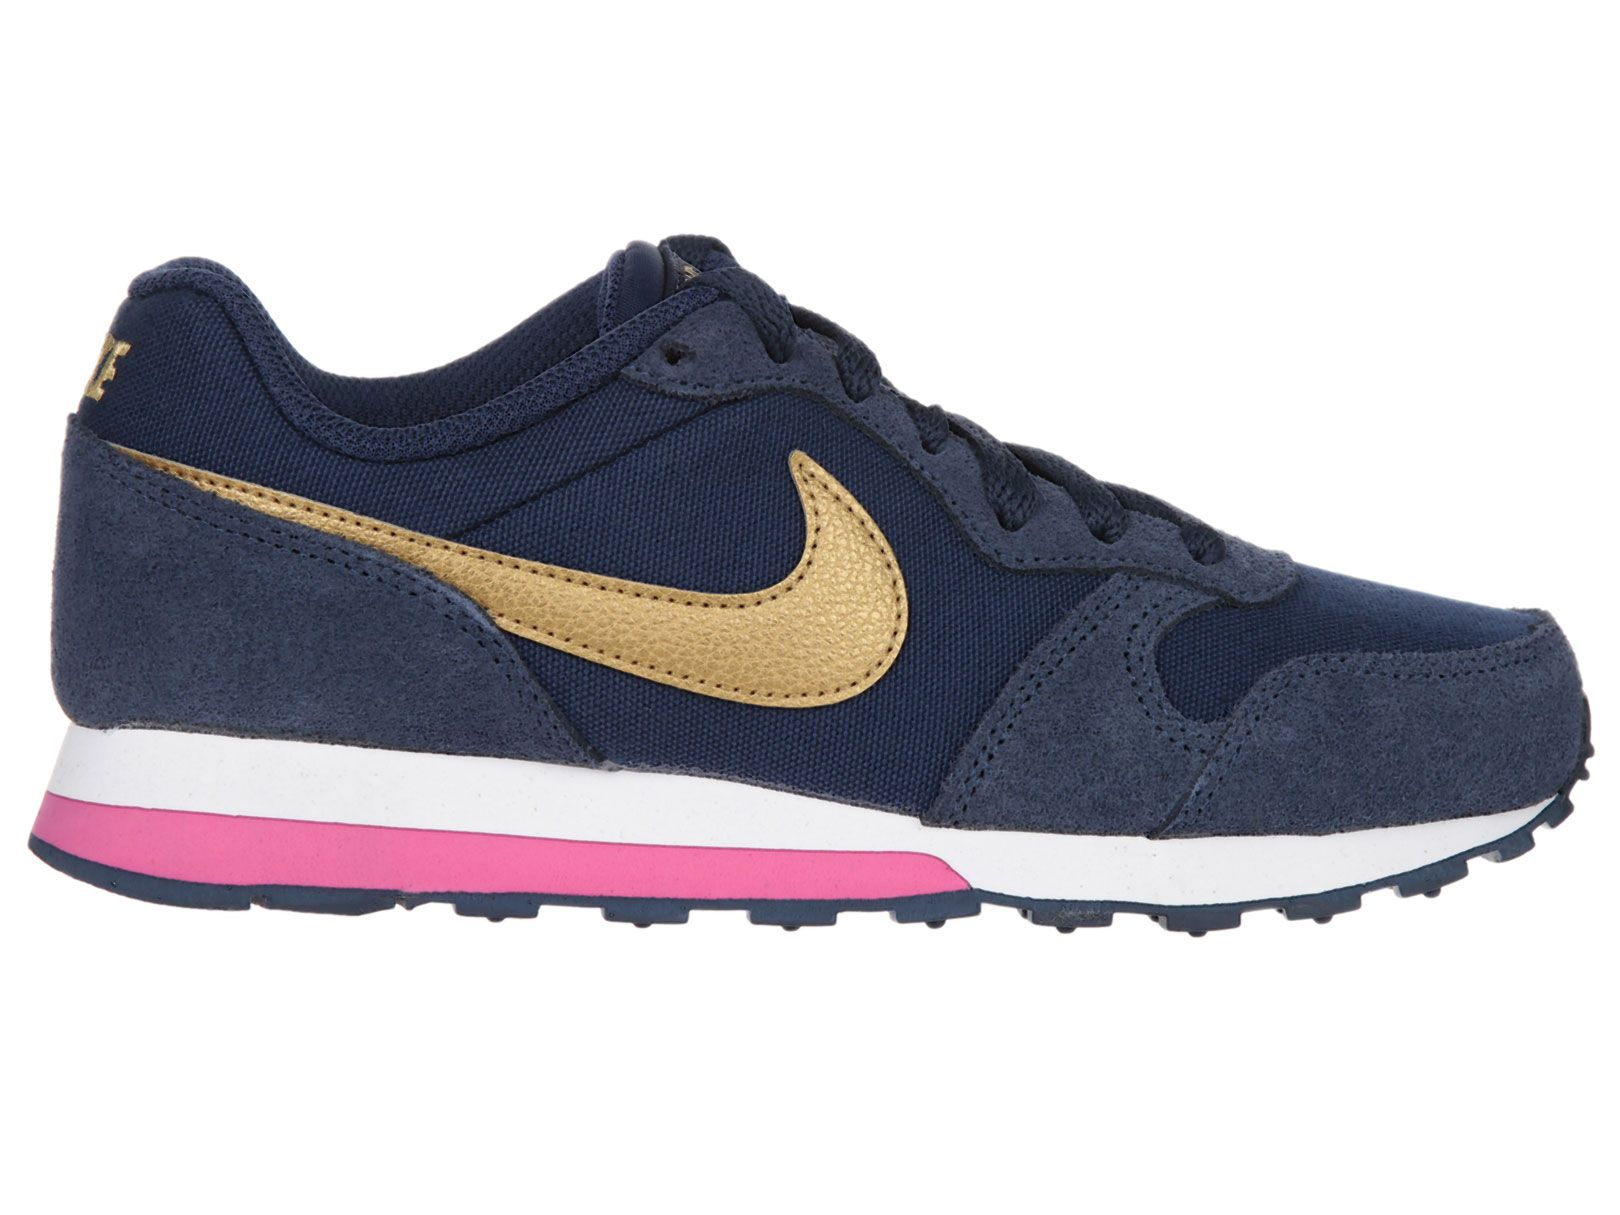 9effac5b5e6 Tenis Nike Md Runner 2 para niña